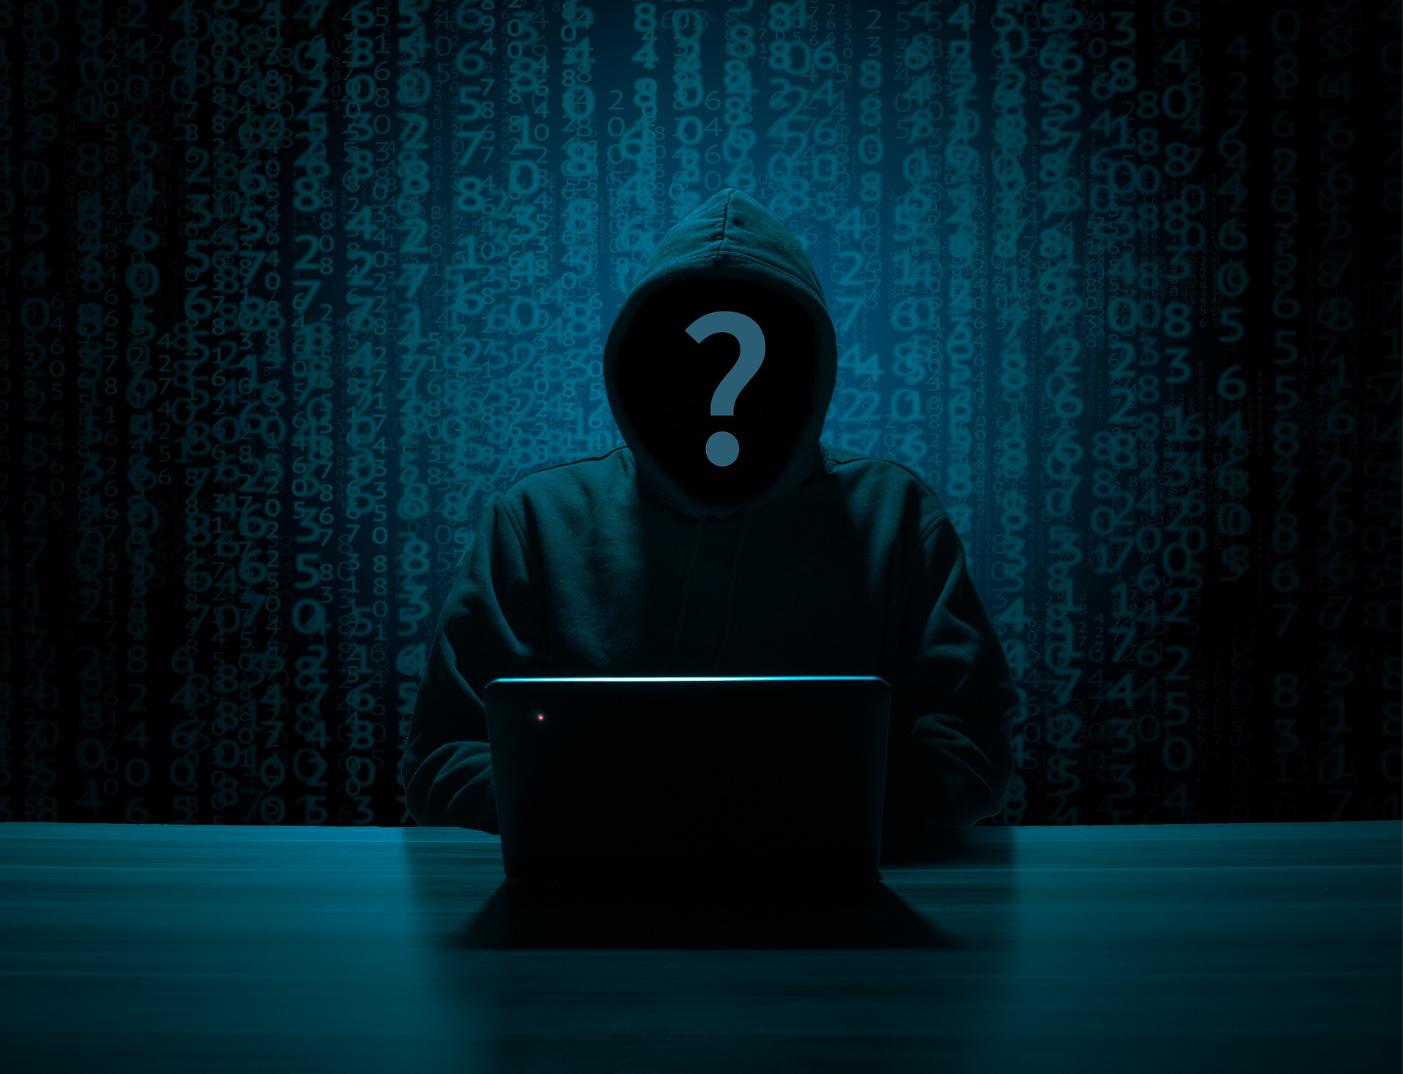 5 Hal yang Harus Diwaspadai dari Incaran Hacker di 2021